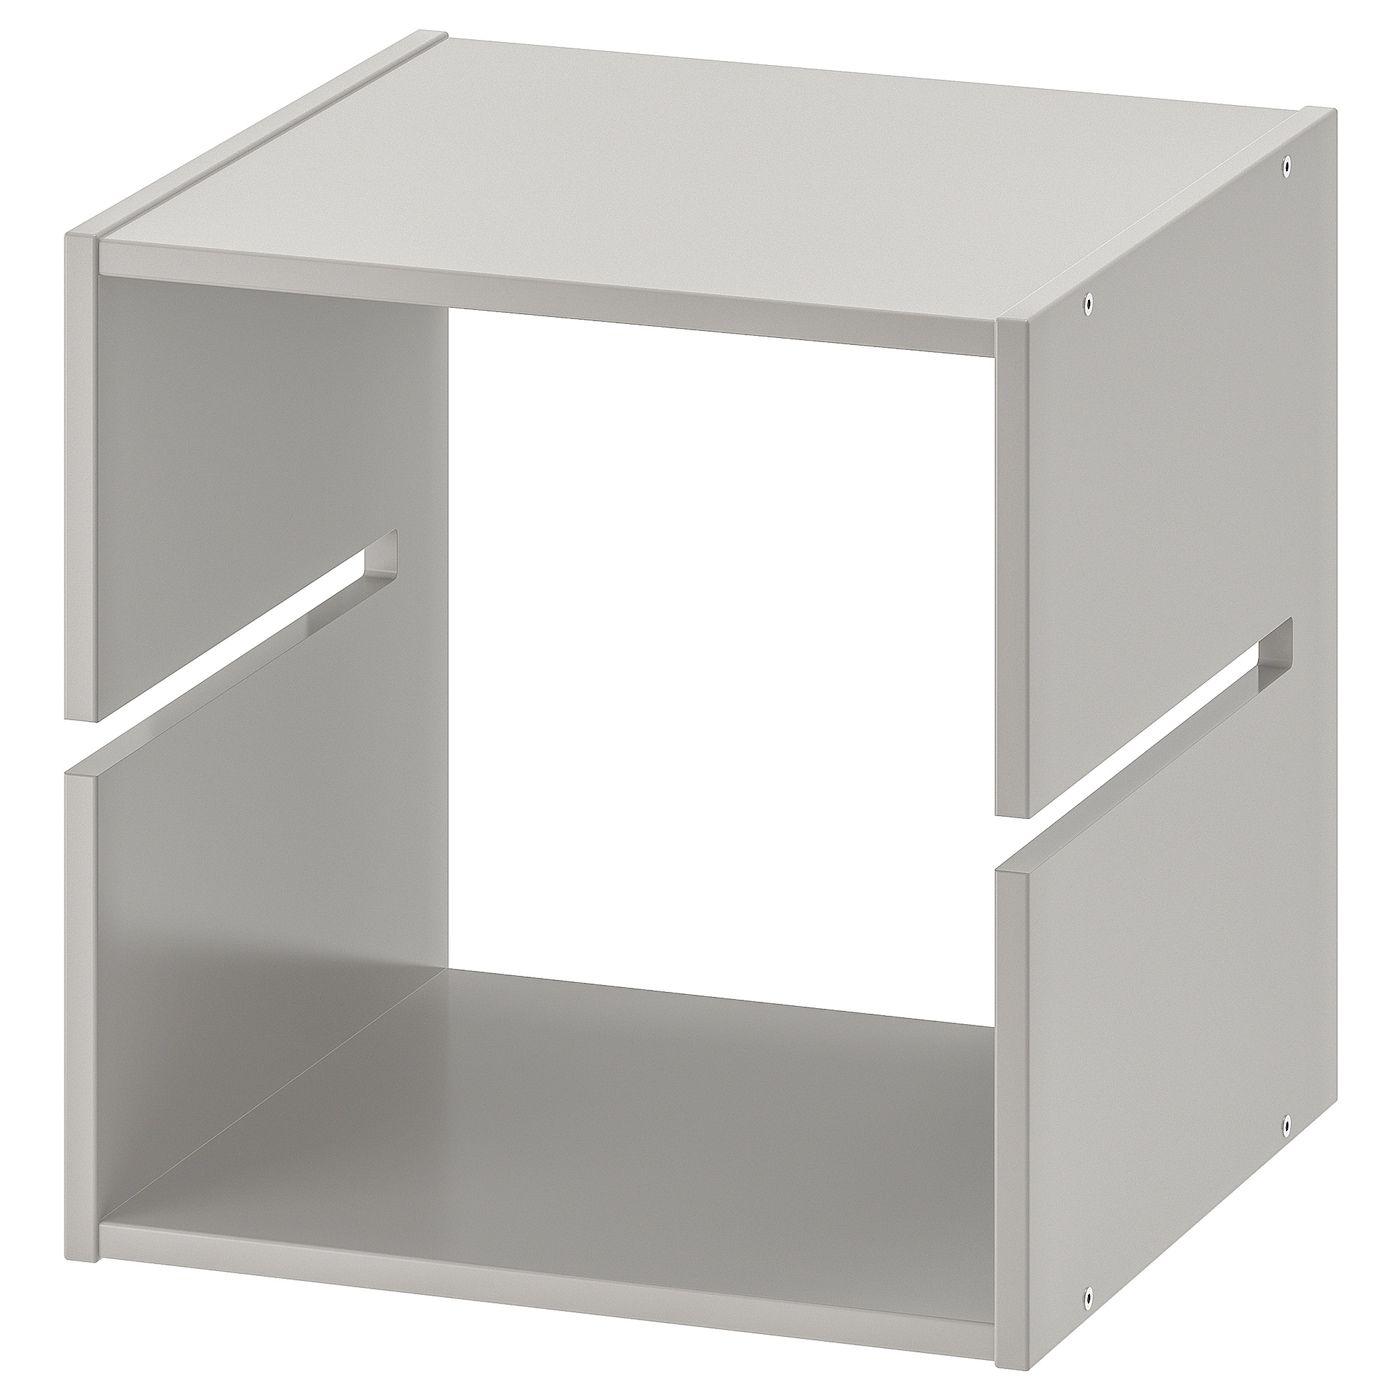 Ikea Us Furniture And Home Furnishings Kallax Ikea Etagere Kallax Ikea Kallax